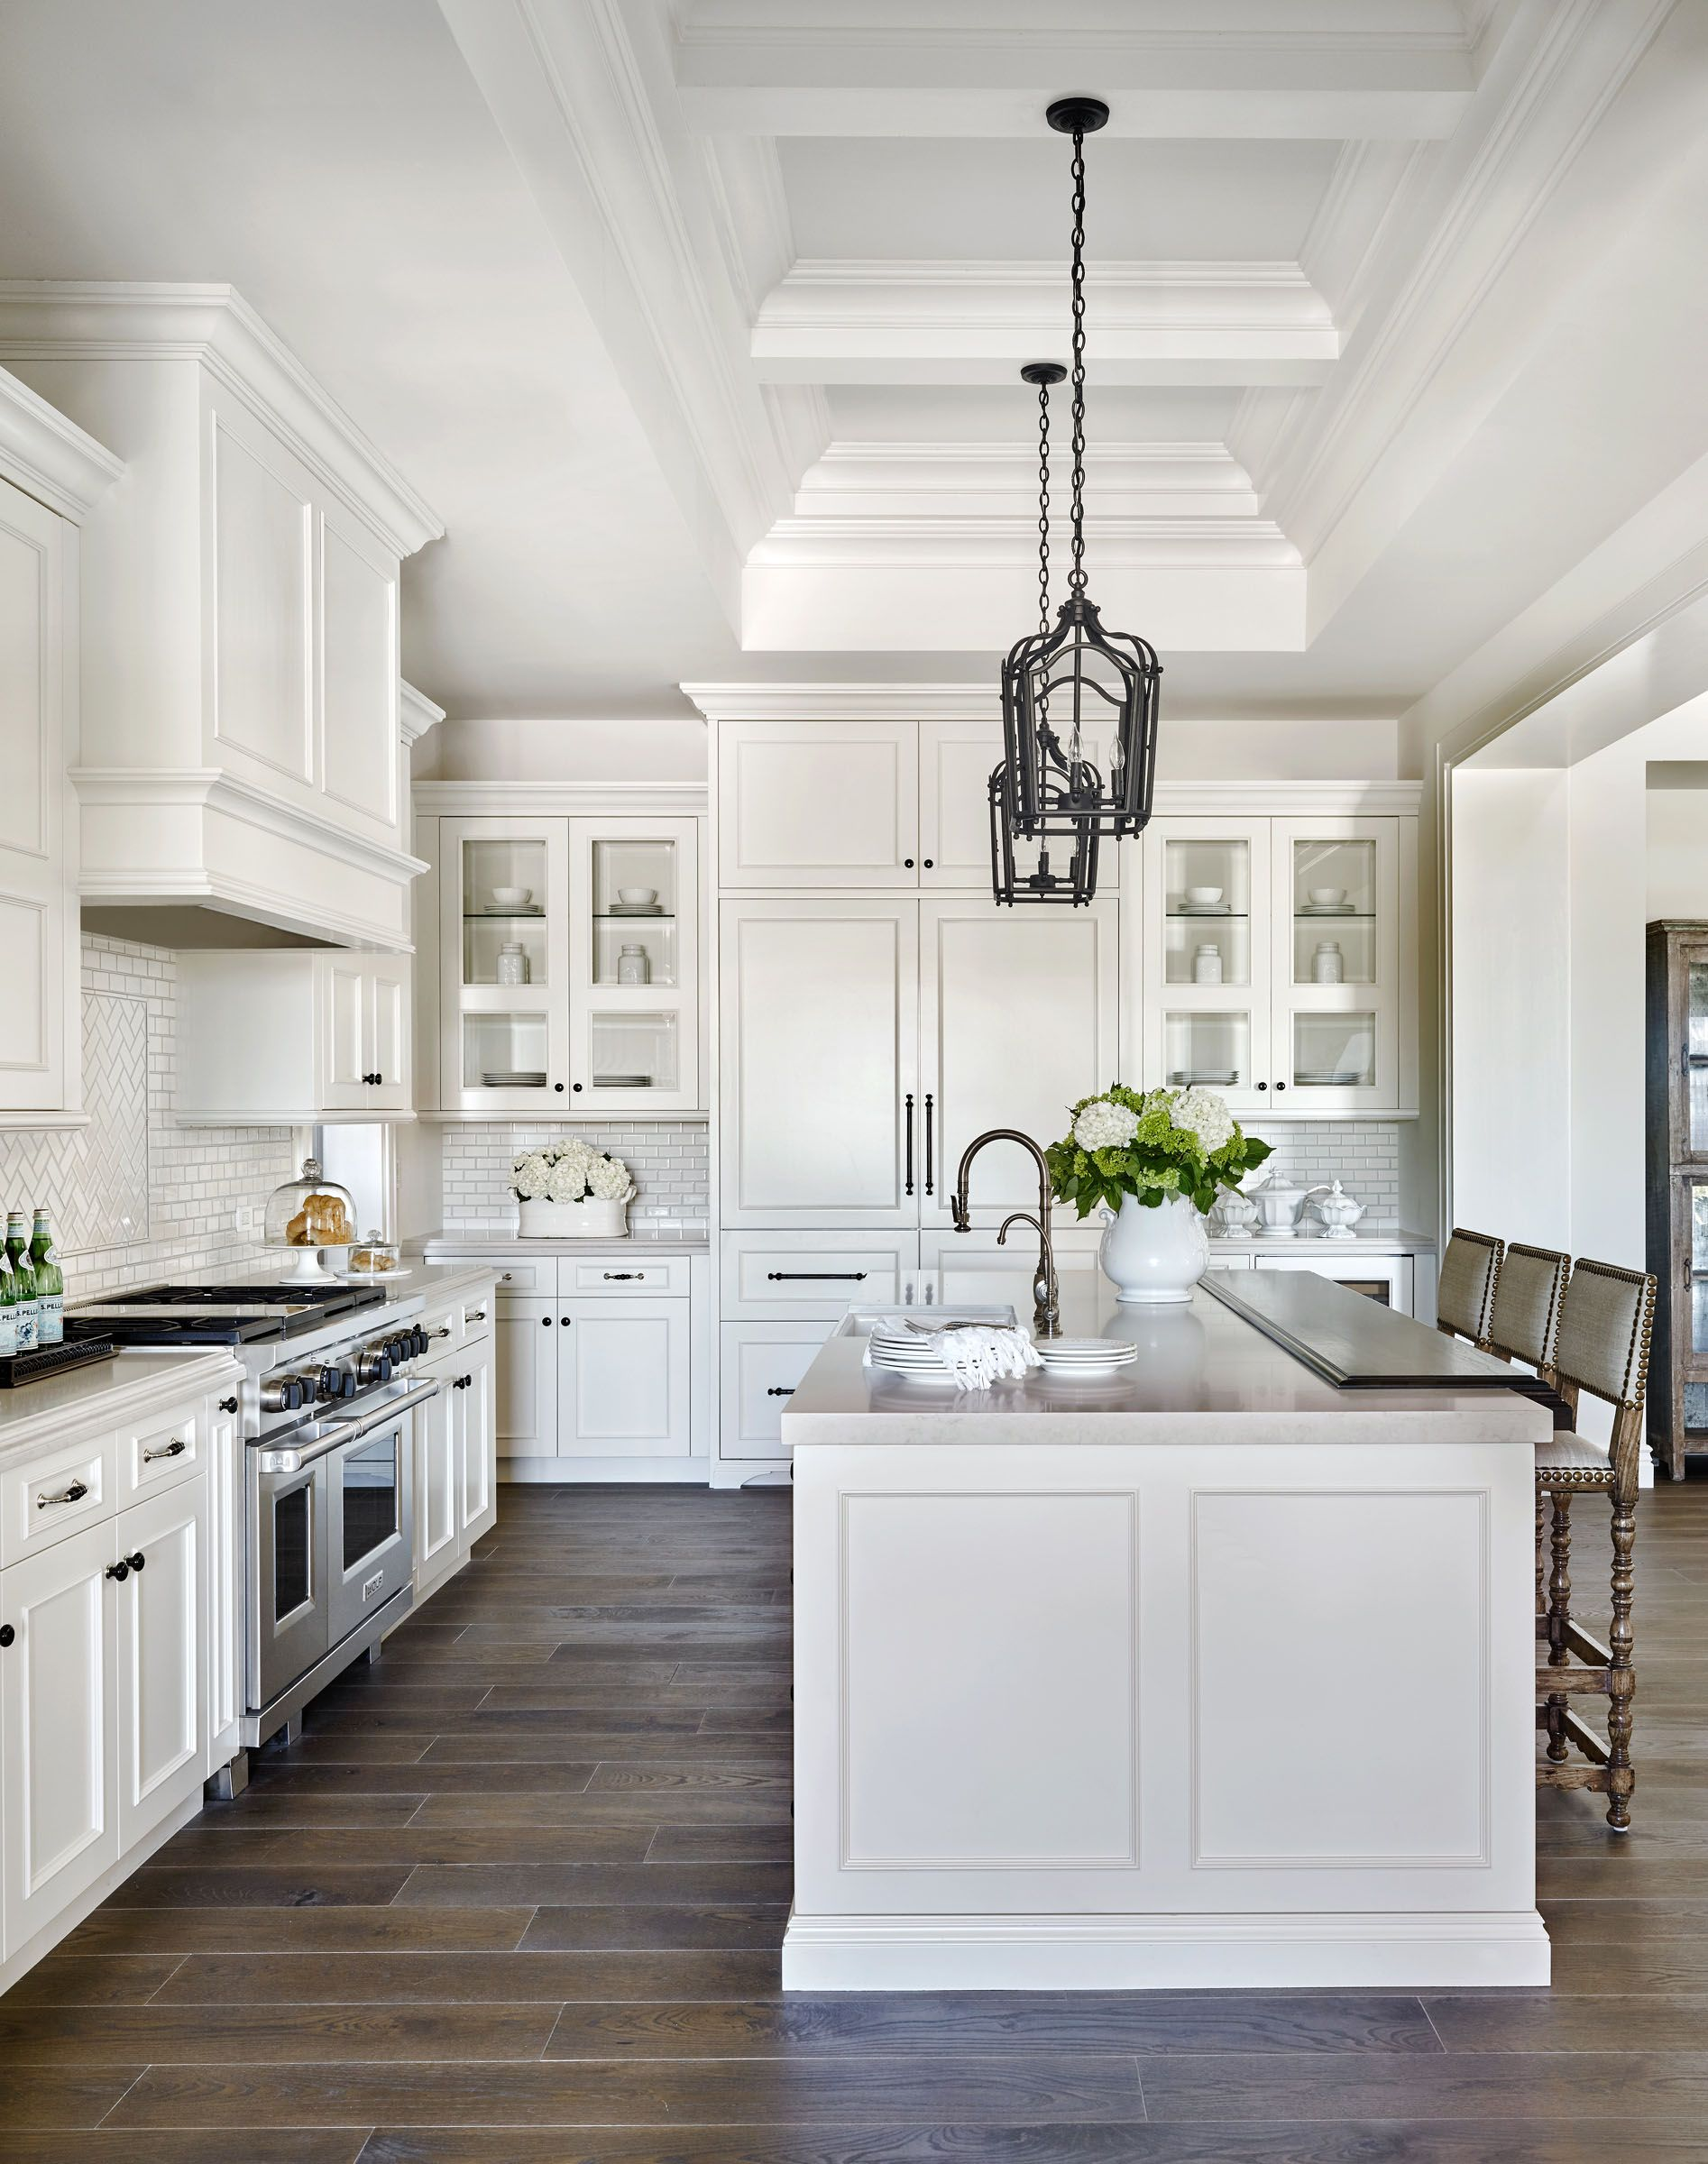 marble kitchen floor inexpensive backsplashes for kitchens elegant with white and hardwood lisa lee hickman